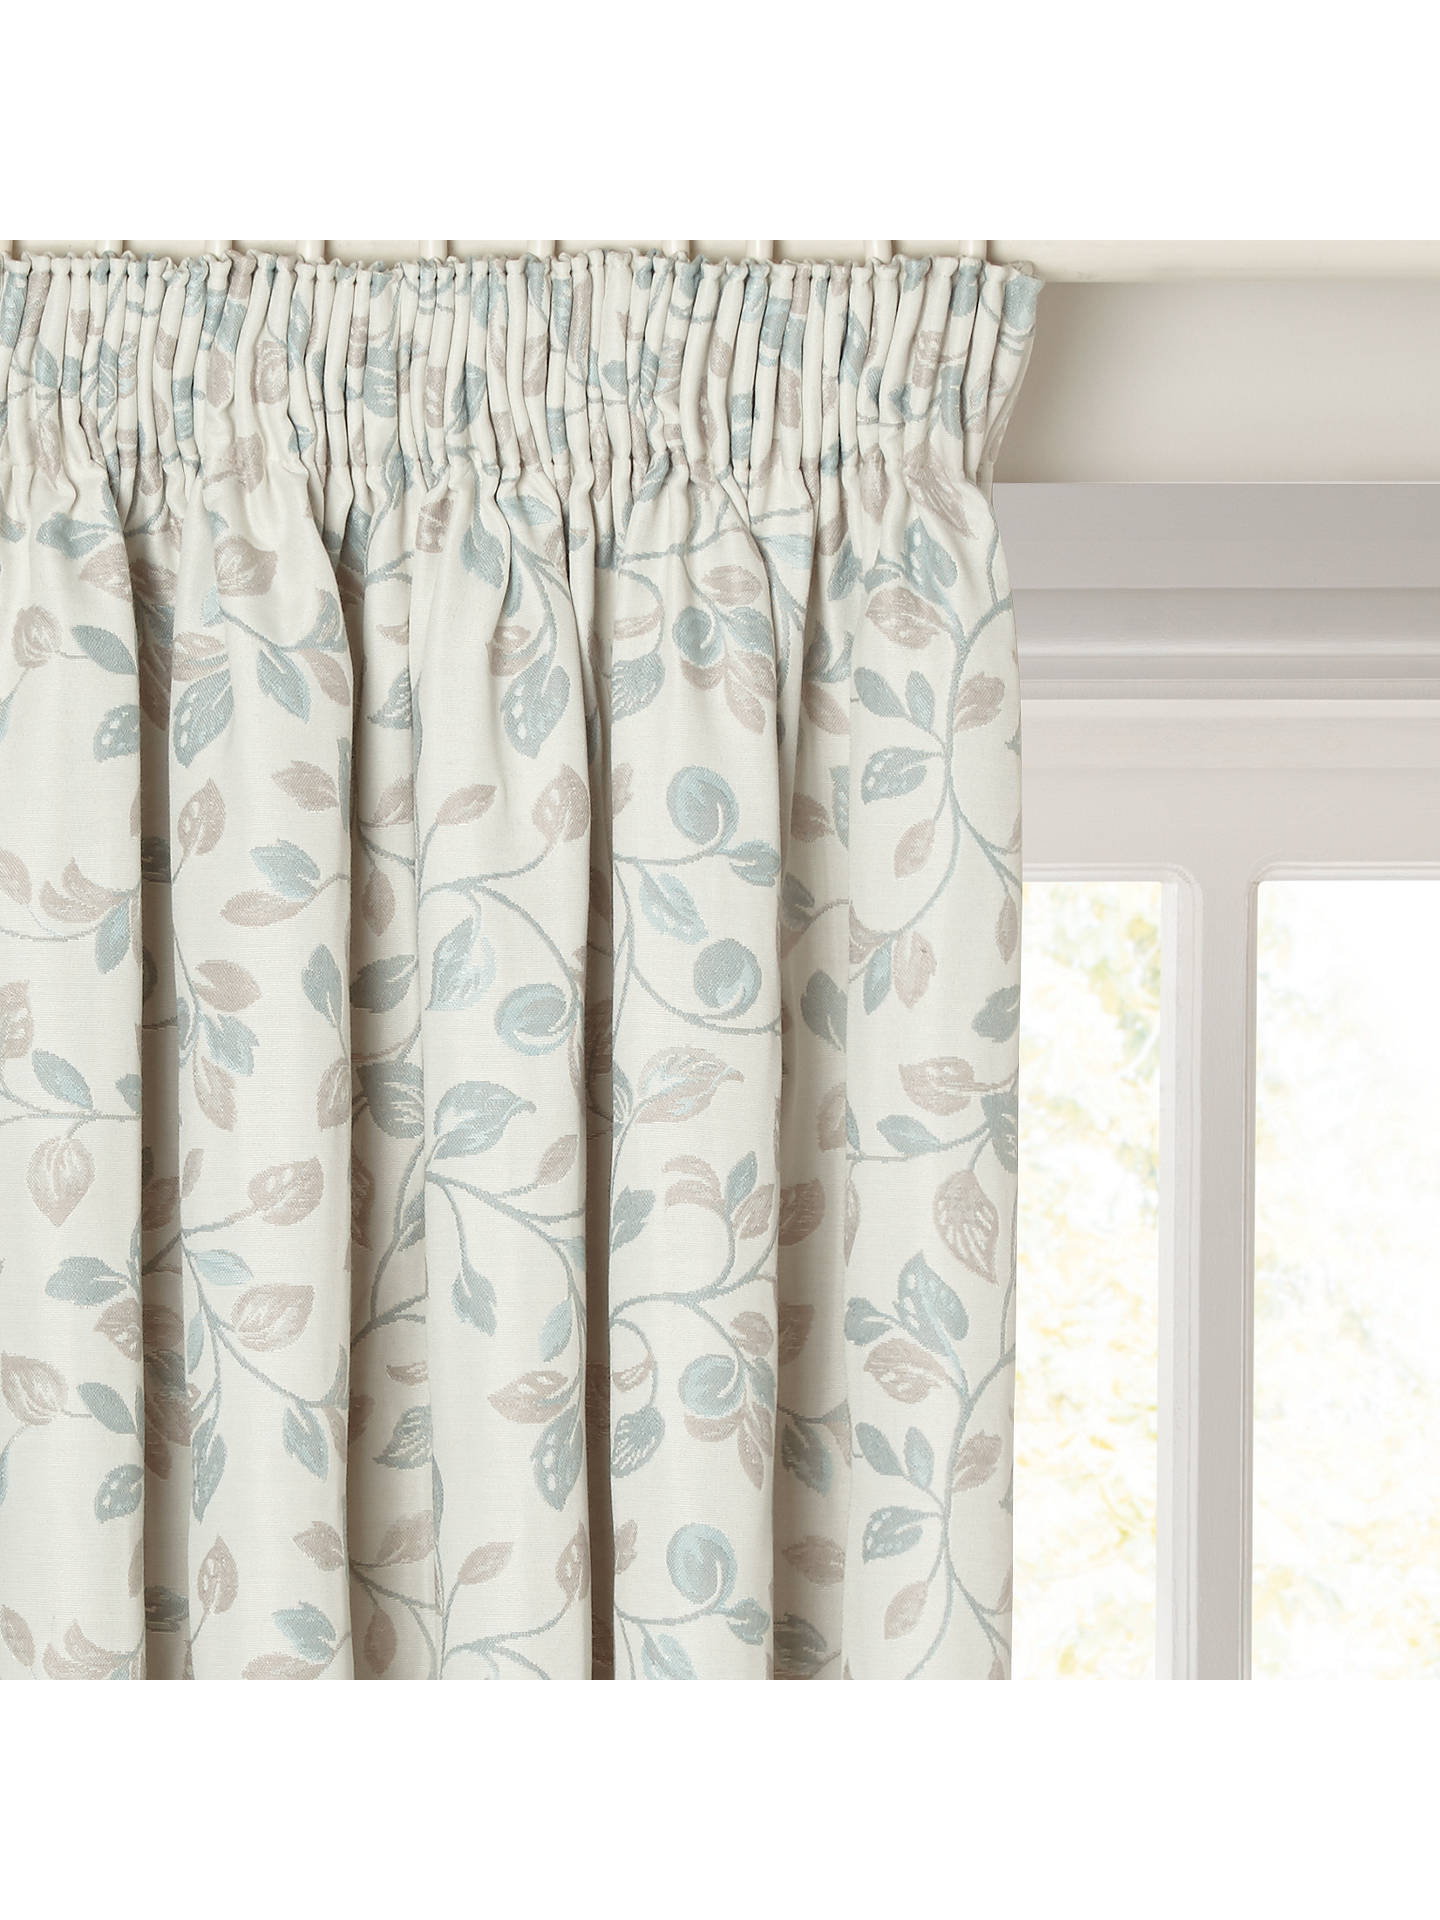 john lewis seedlings curtains blue. Black Bedroom Furniture Sets. Home Design Ideas